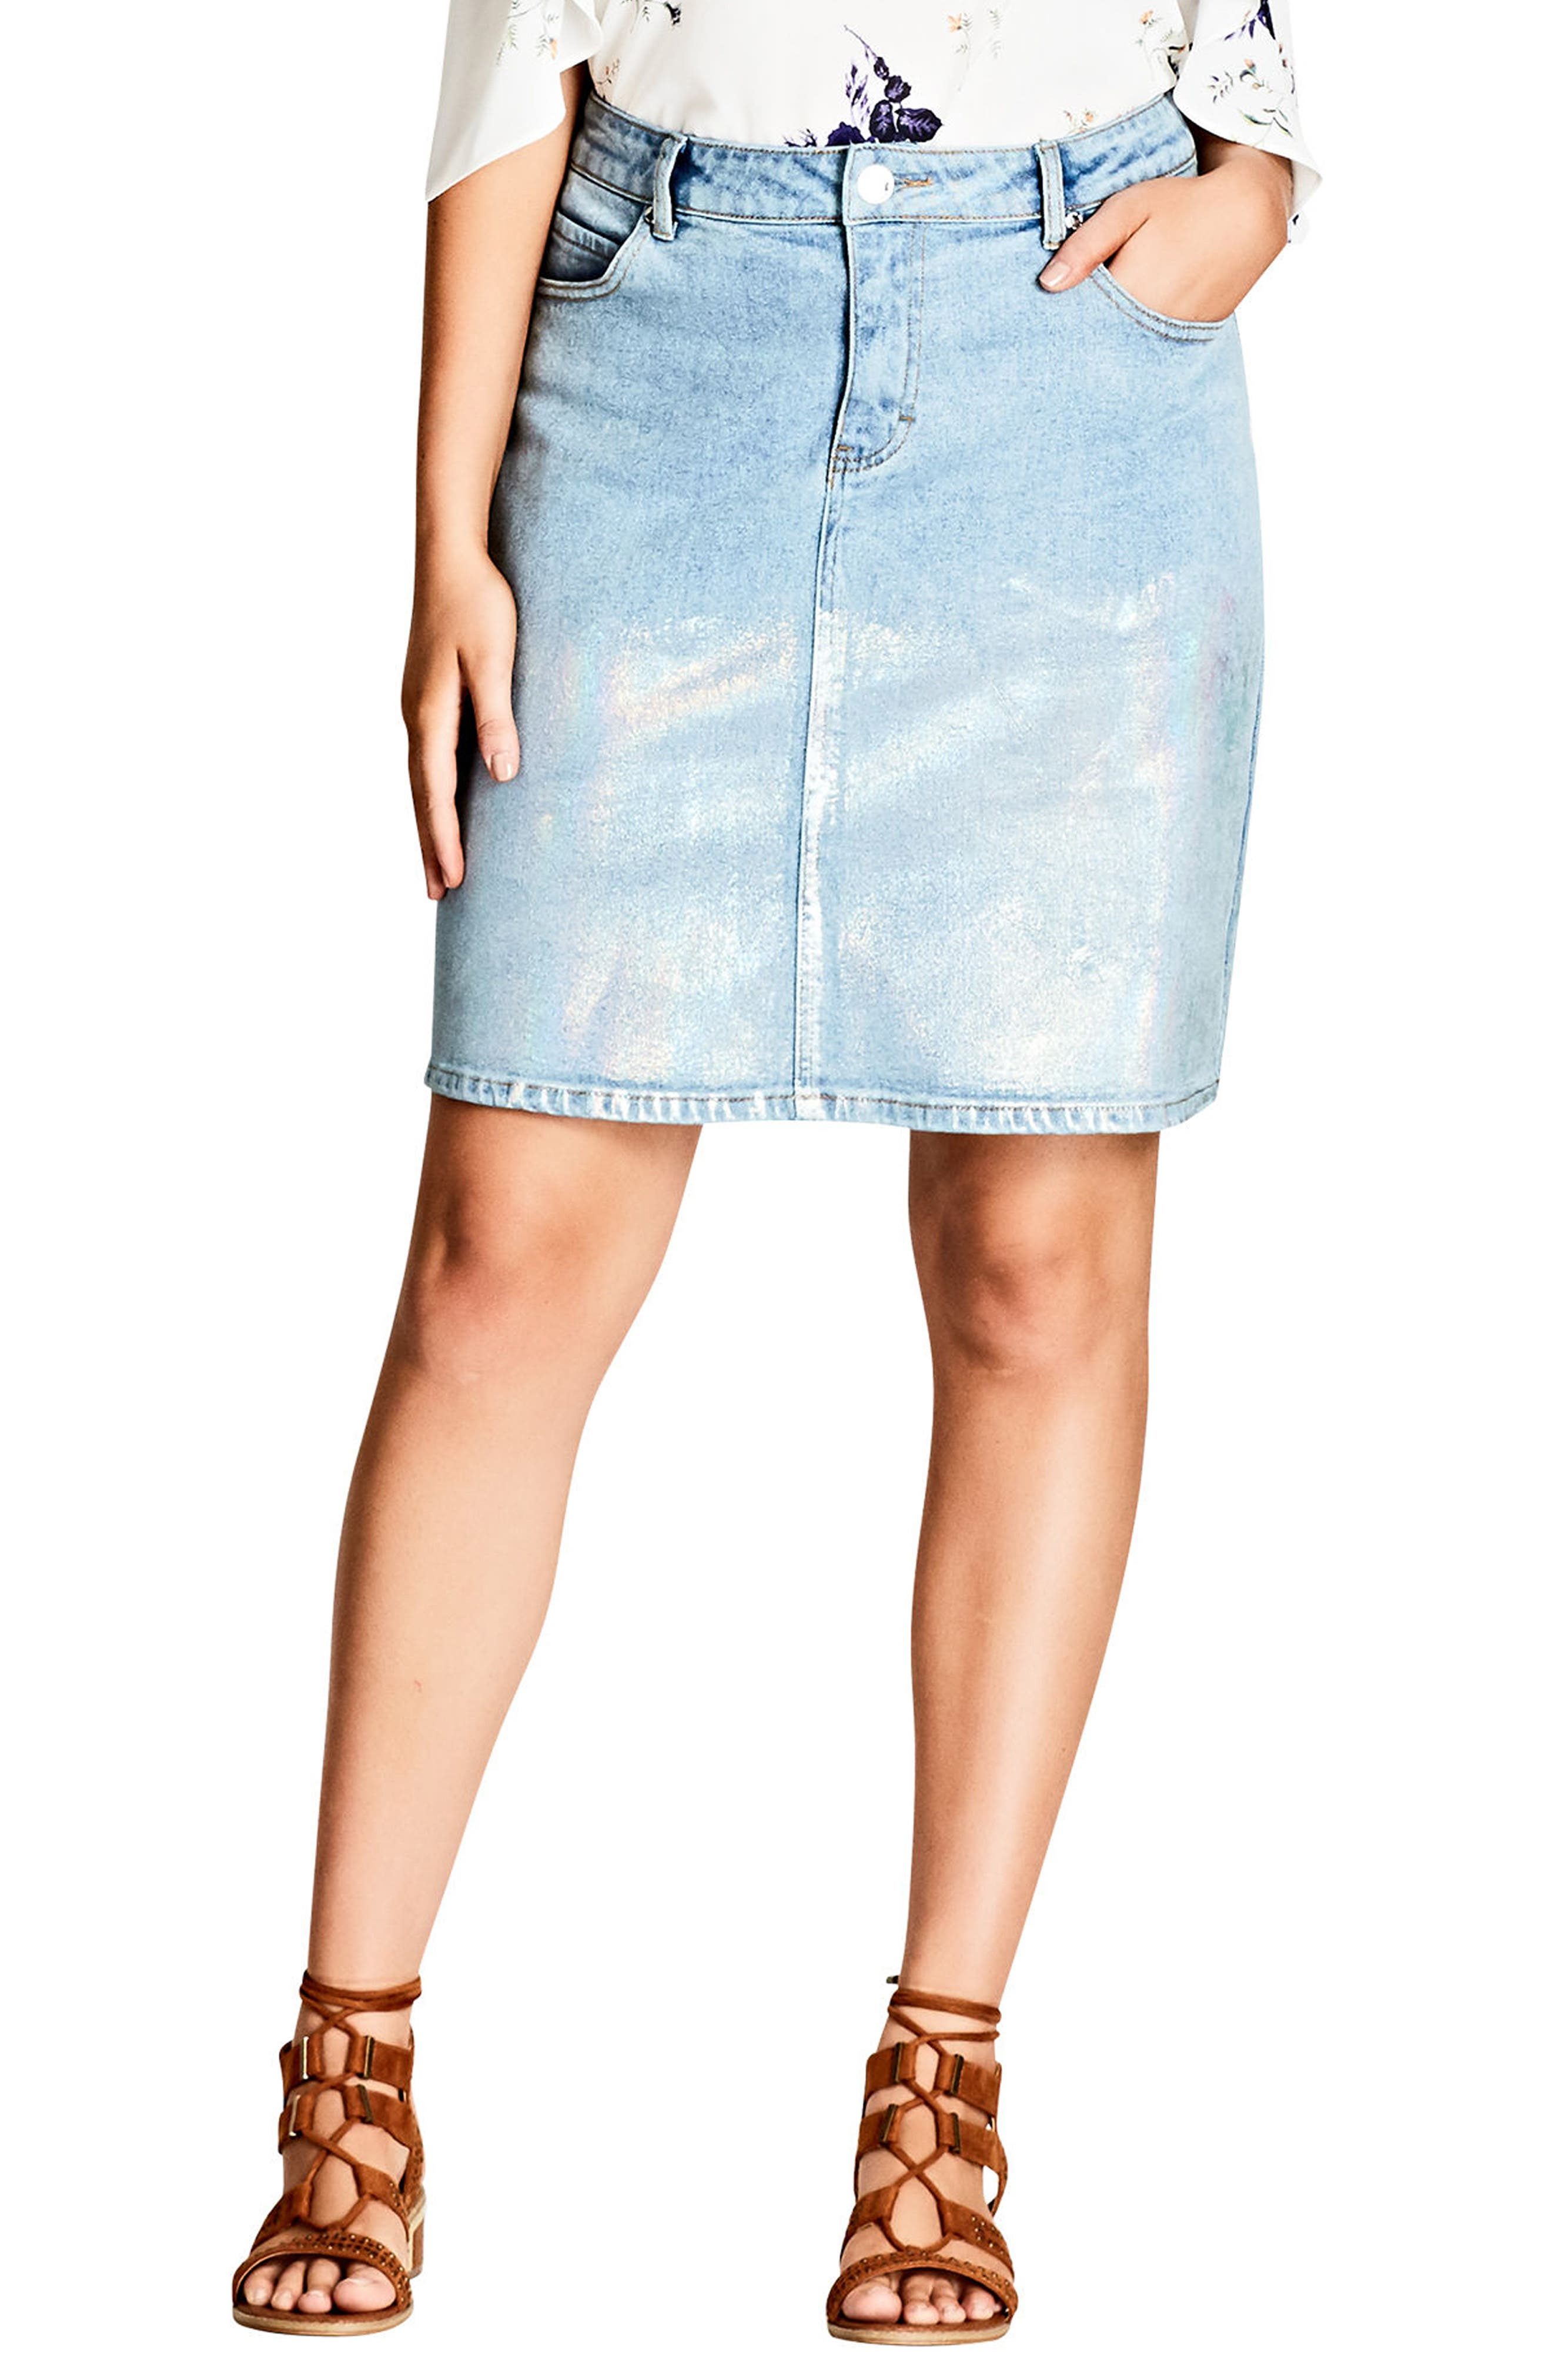 Alternate Image 1 Selected - City Chic Mirror Denim Skirt (Plus Size)